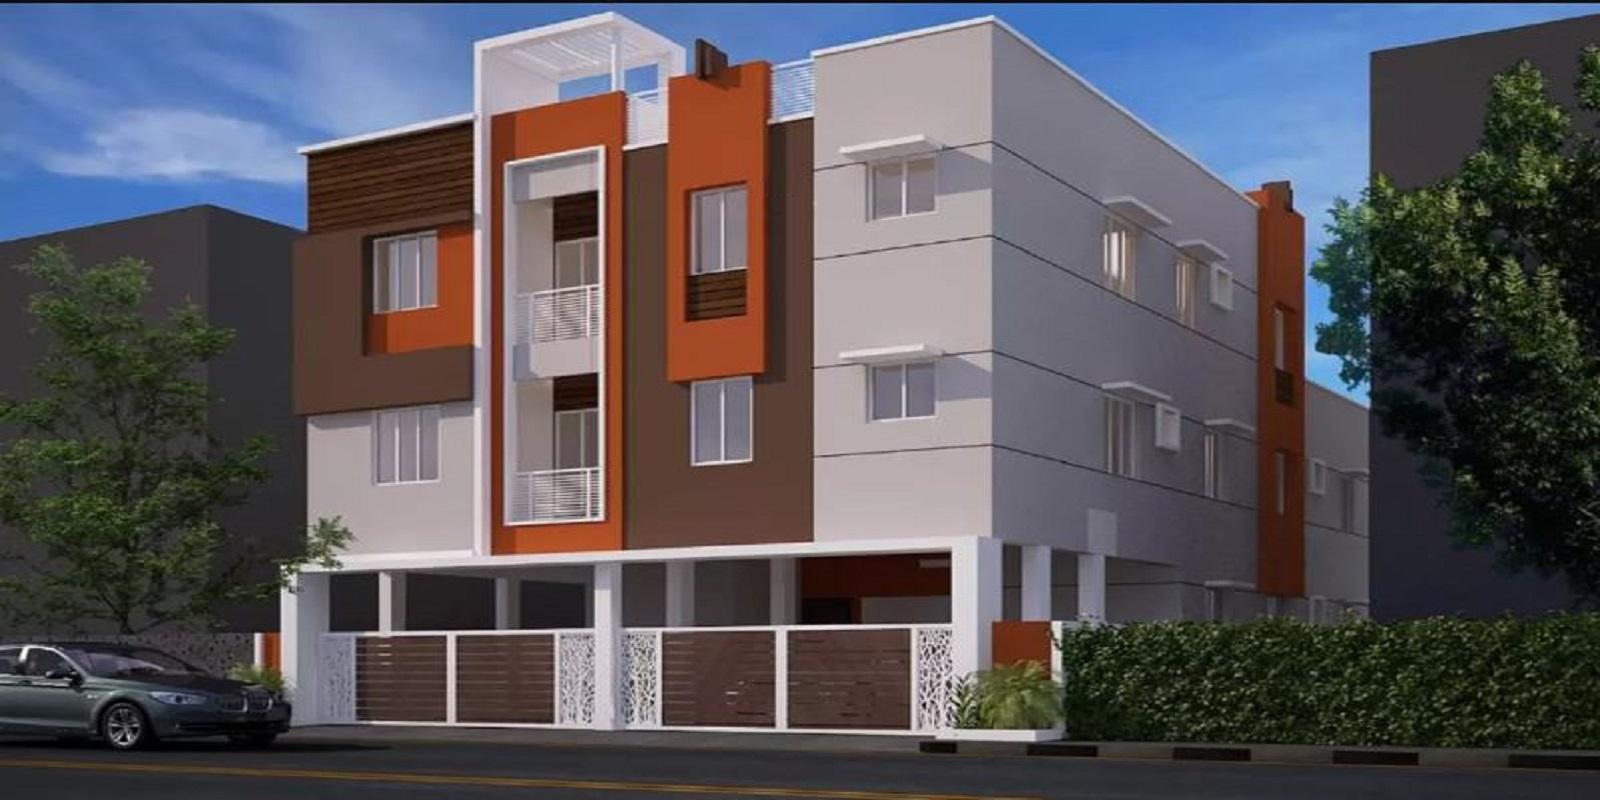 rishi sri archana flats project large image2